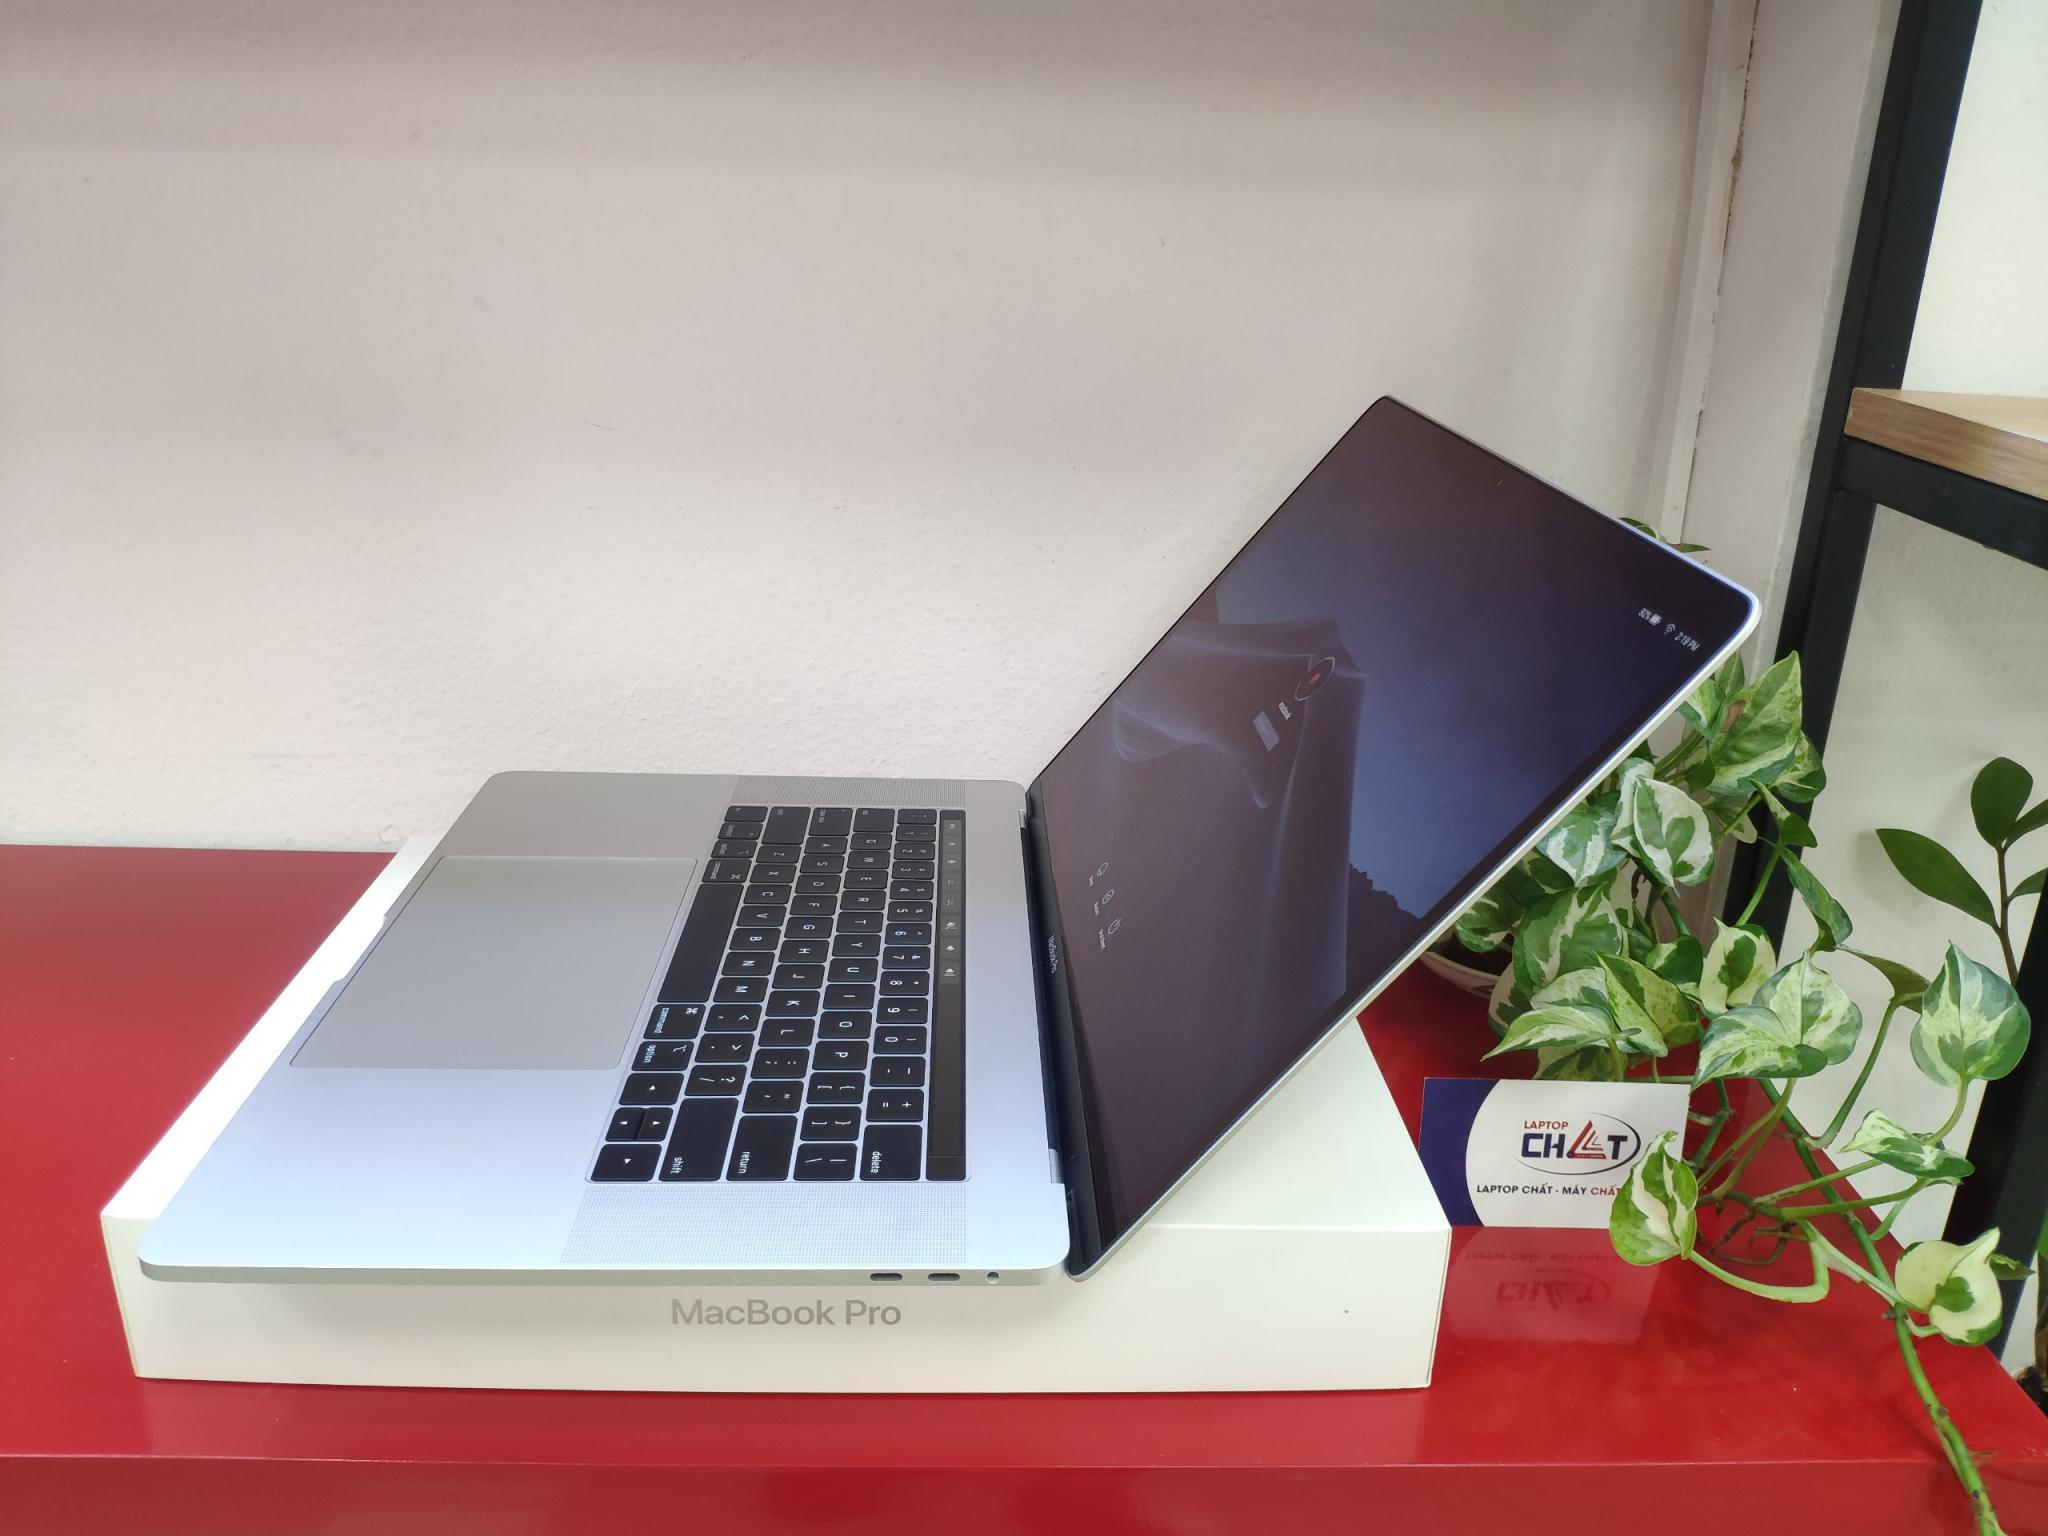 Macbook Pro 15 inch 2018 Core I7 32GB 256GB SSD AMD PRO 555X 4GB openbox